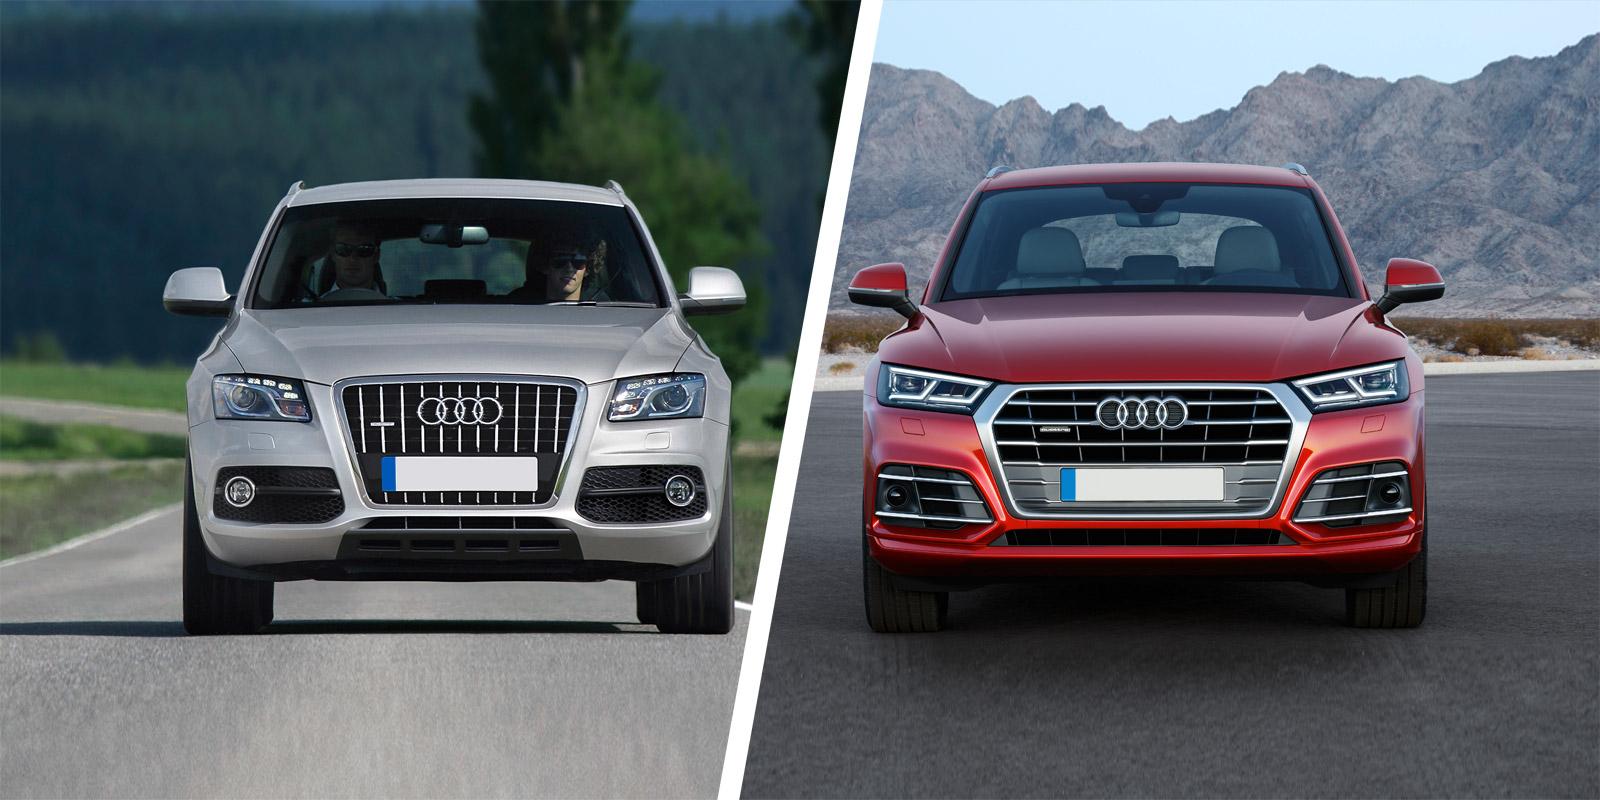 Audi Q5 SUV new vs old compared | carwow